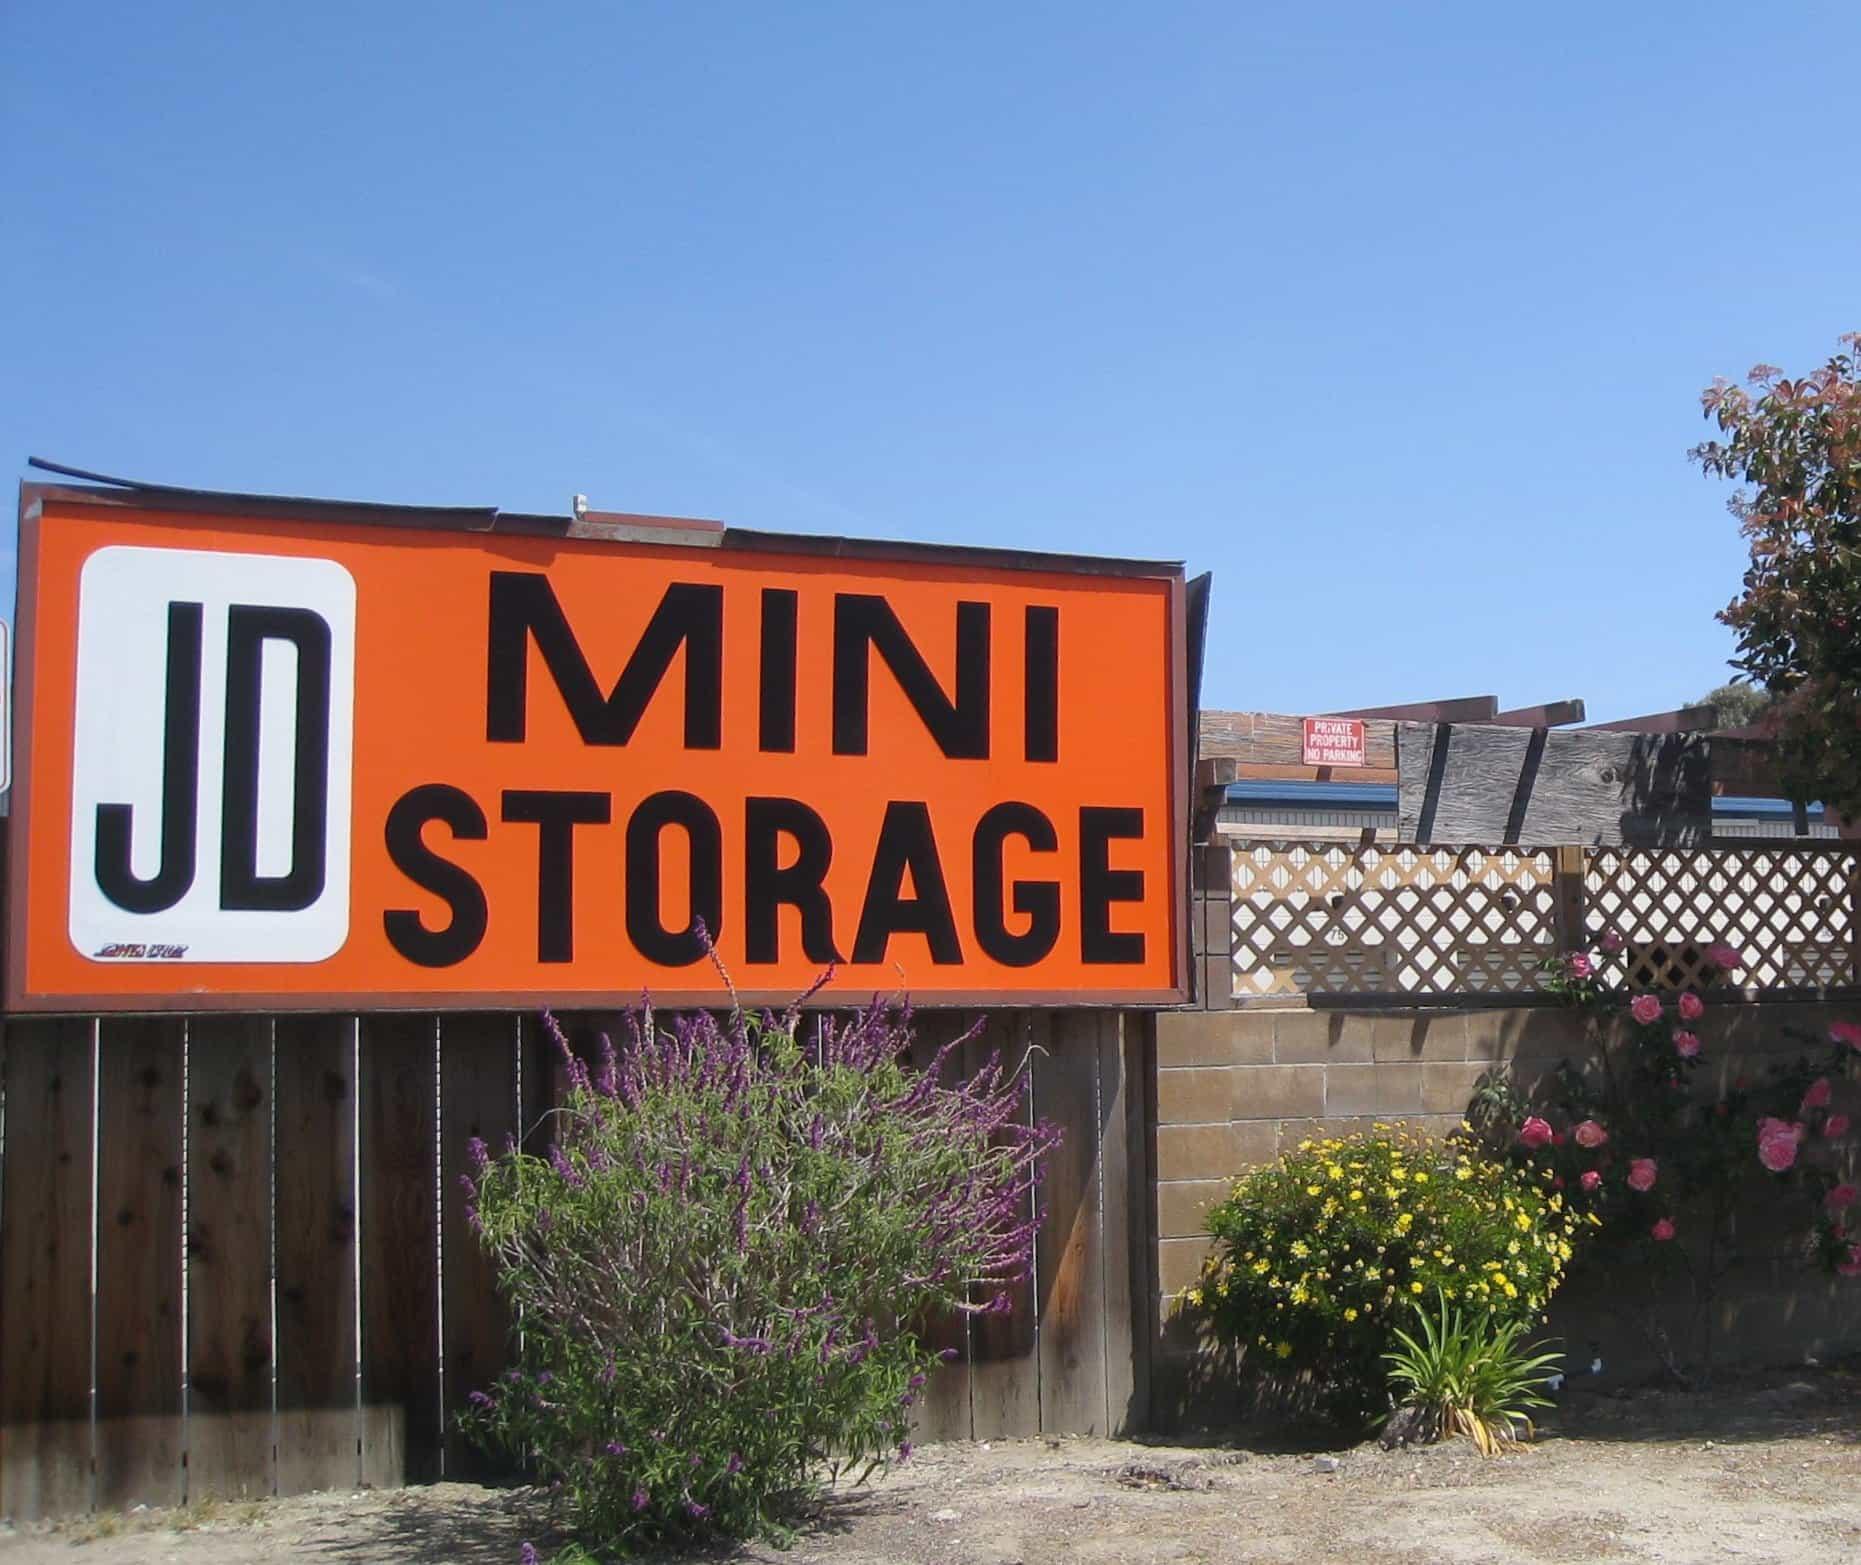 JD Mini Storage in Capitola